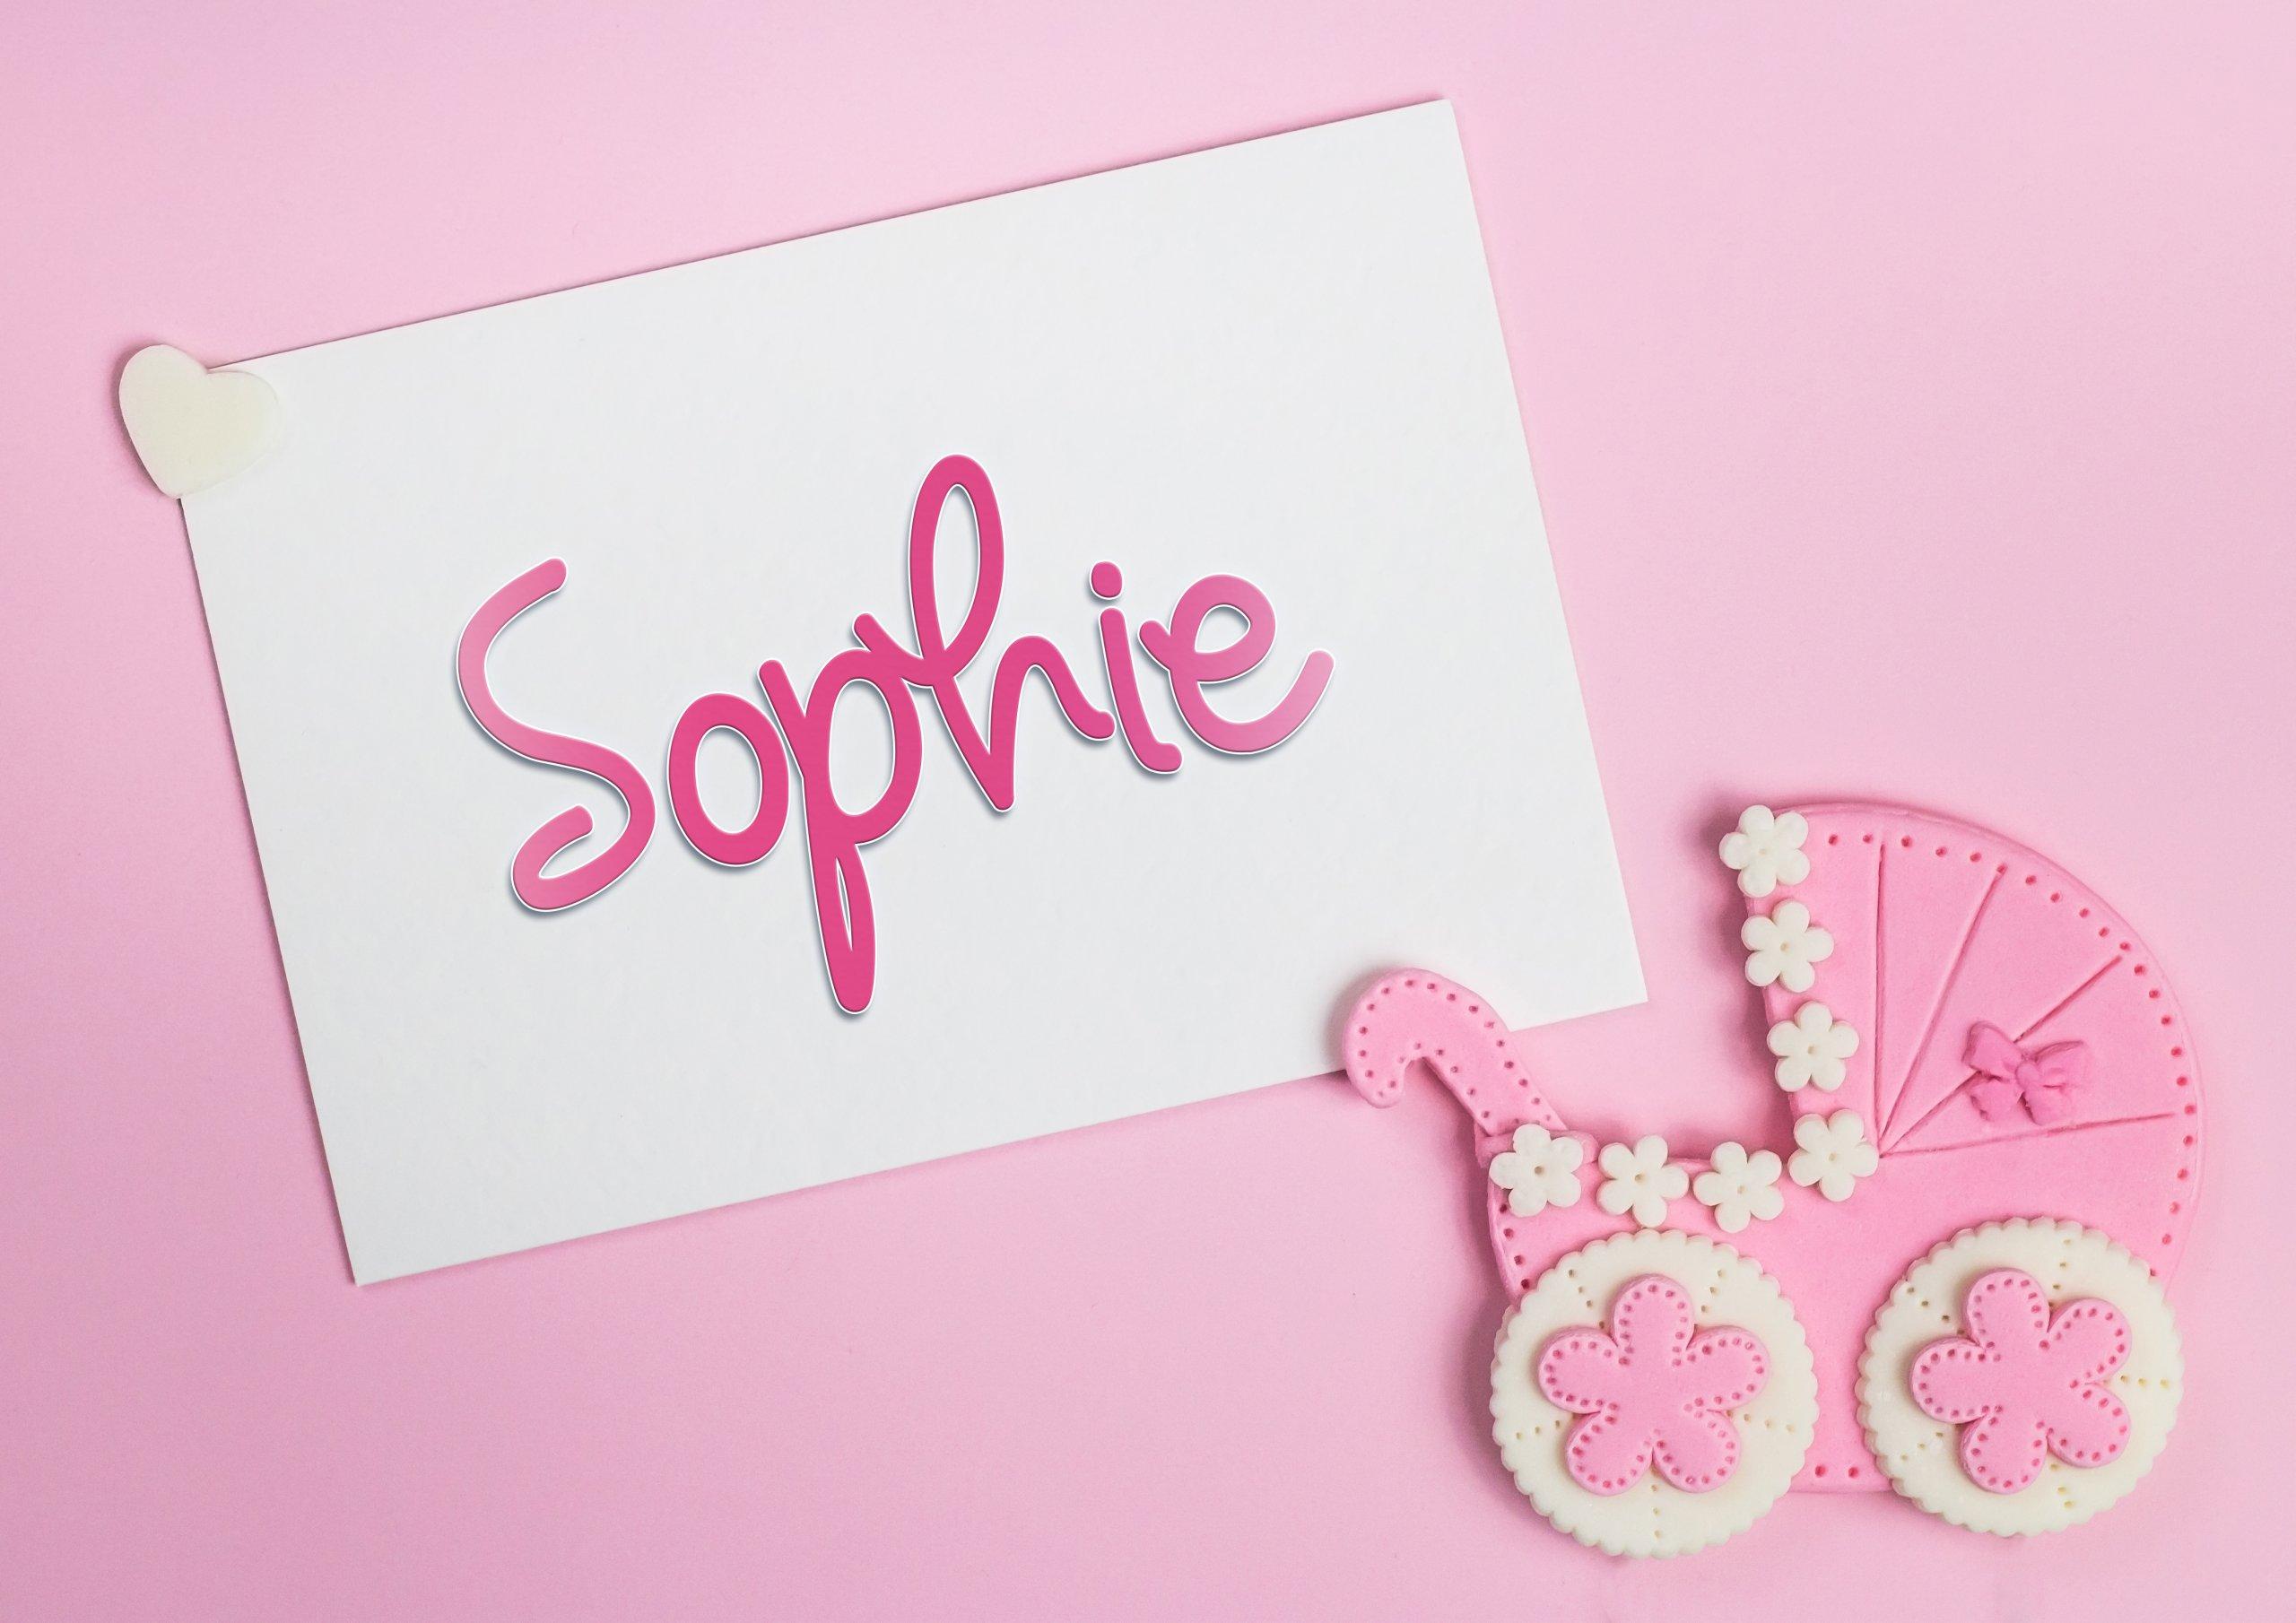 meaning sophia